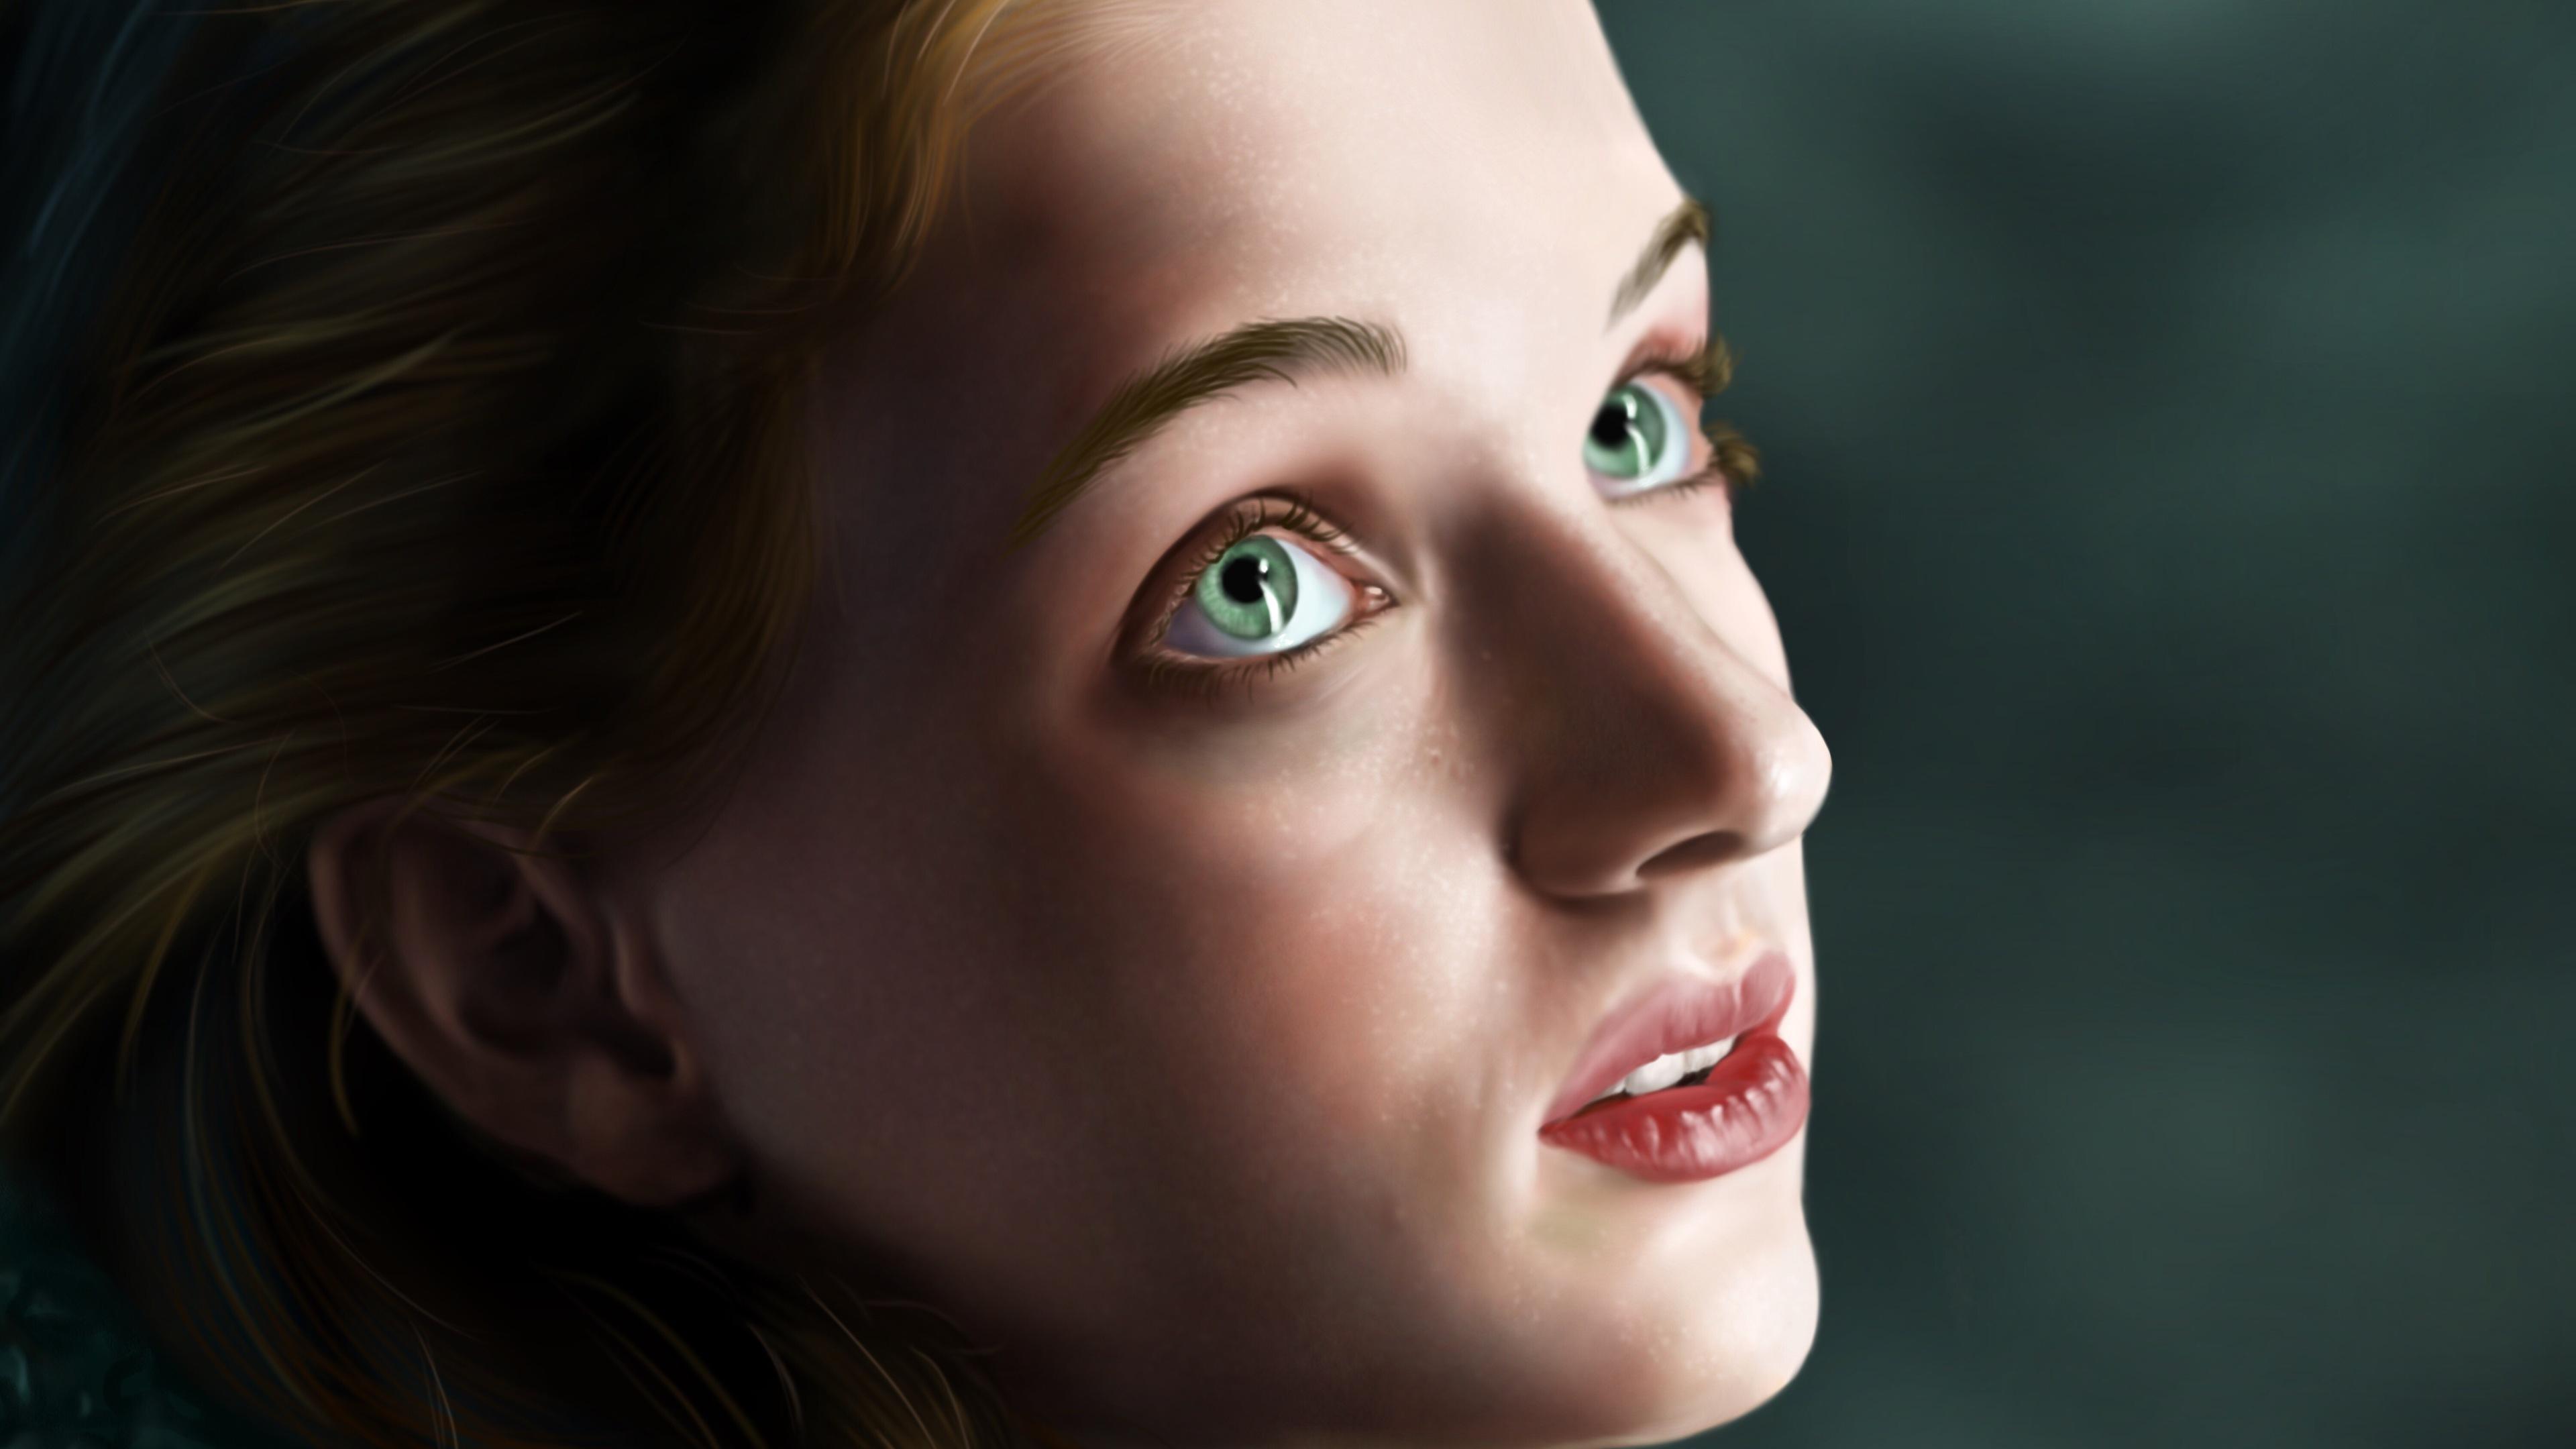 sophie-turner-5k-portrait-fanart-9s.jpg